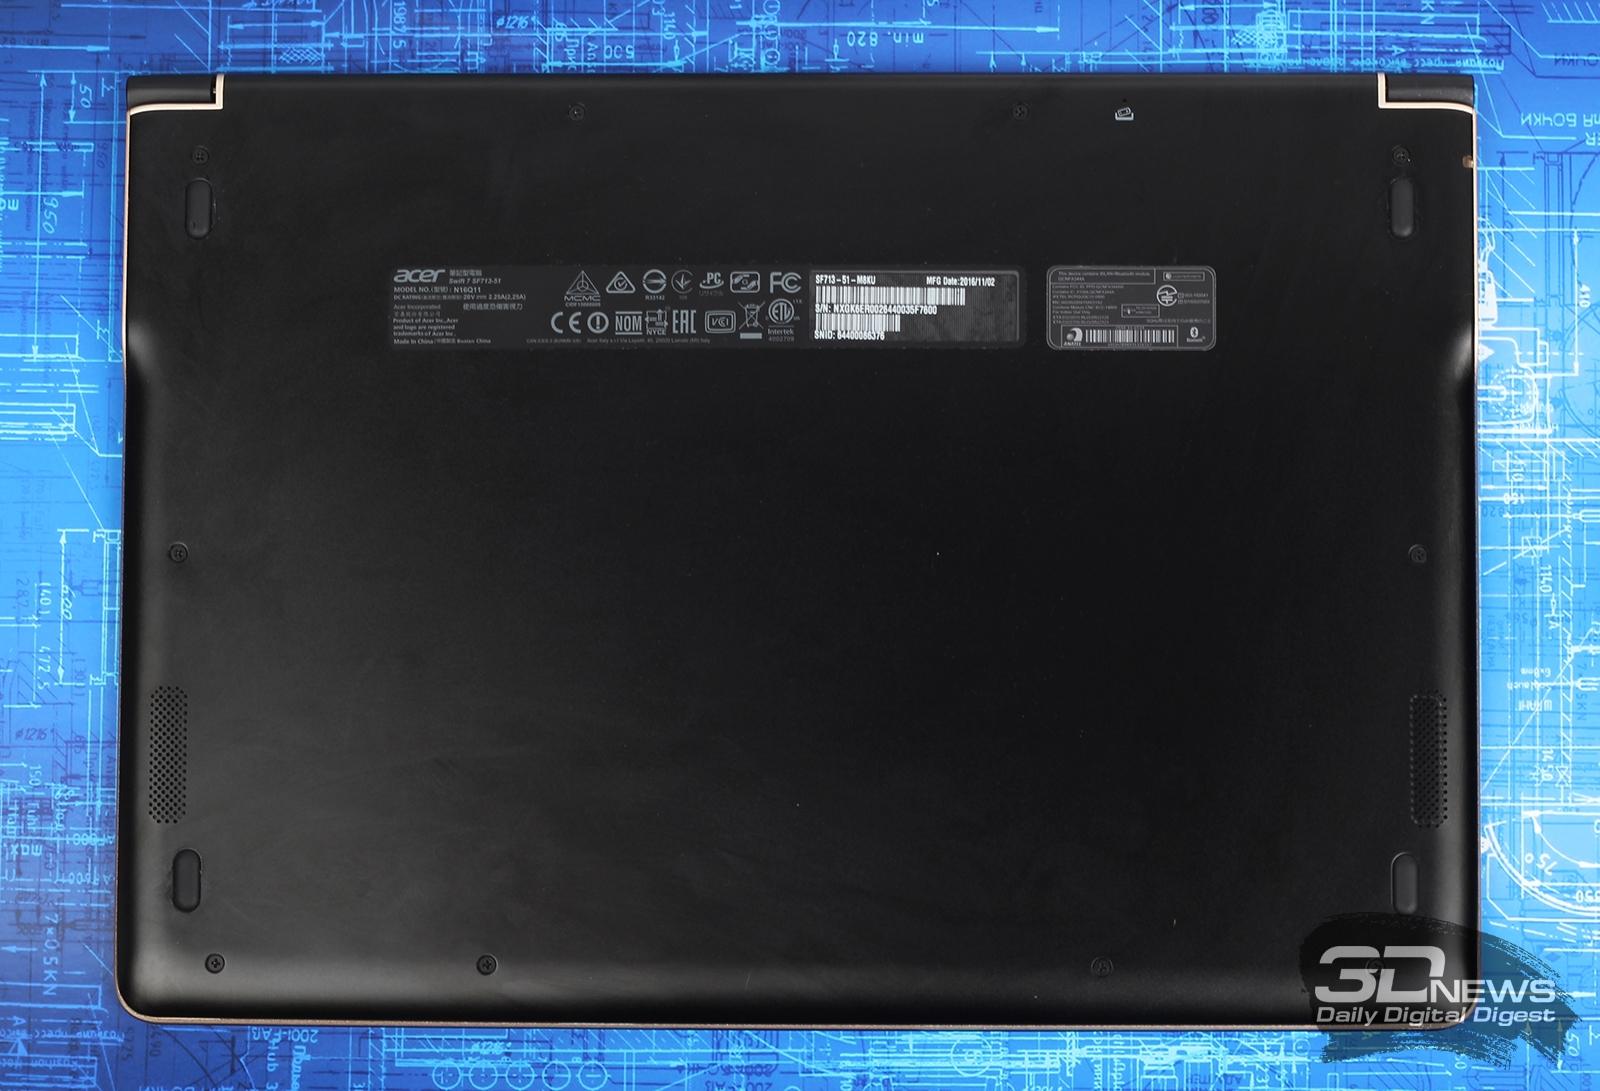 ACER POWER FG MODEM DRIVERS WINDOWS XP